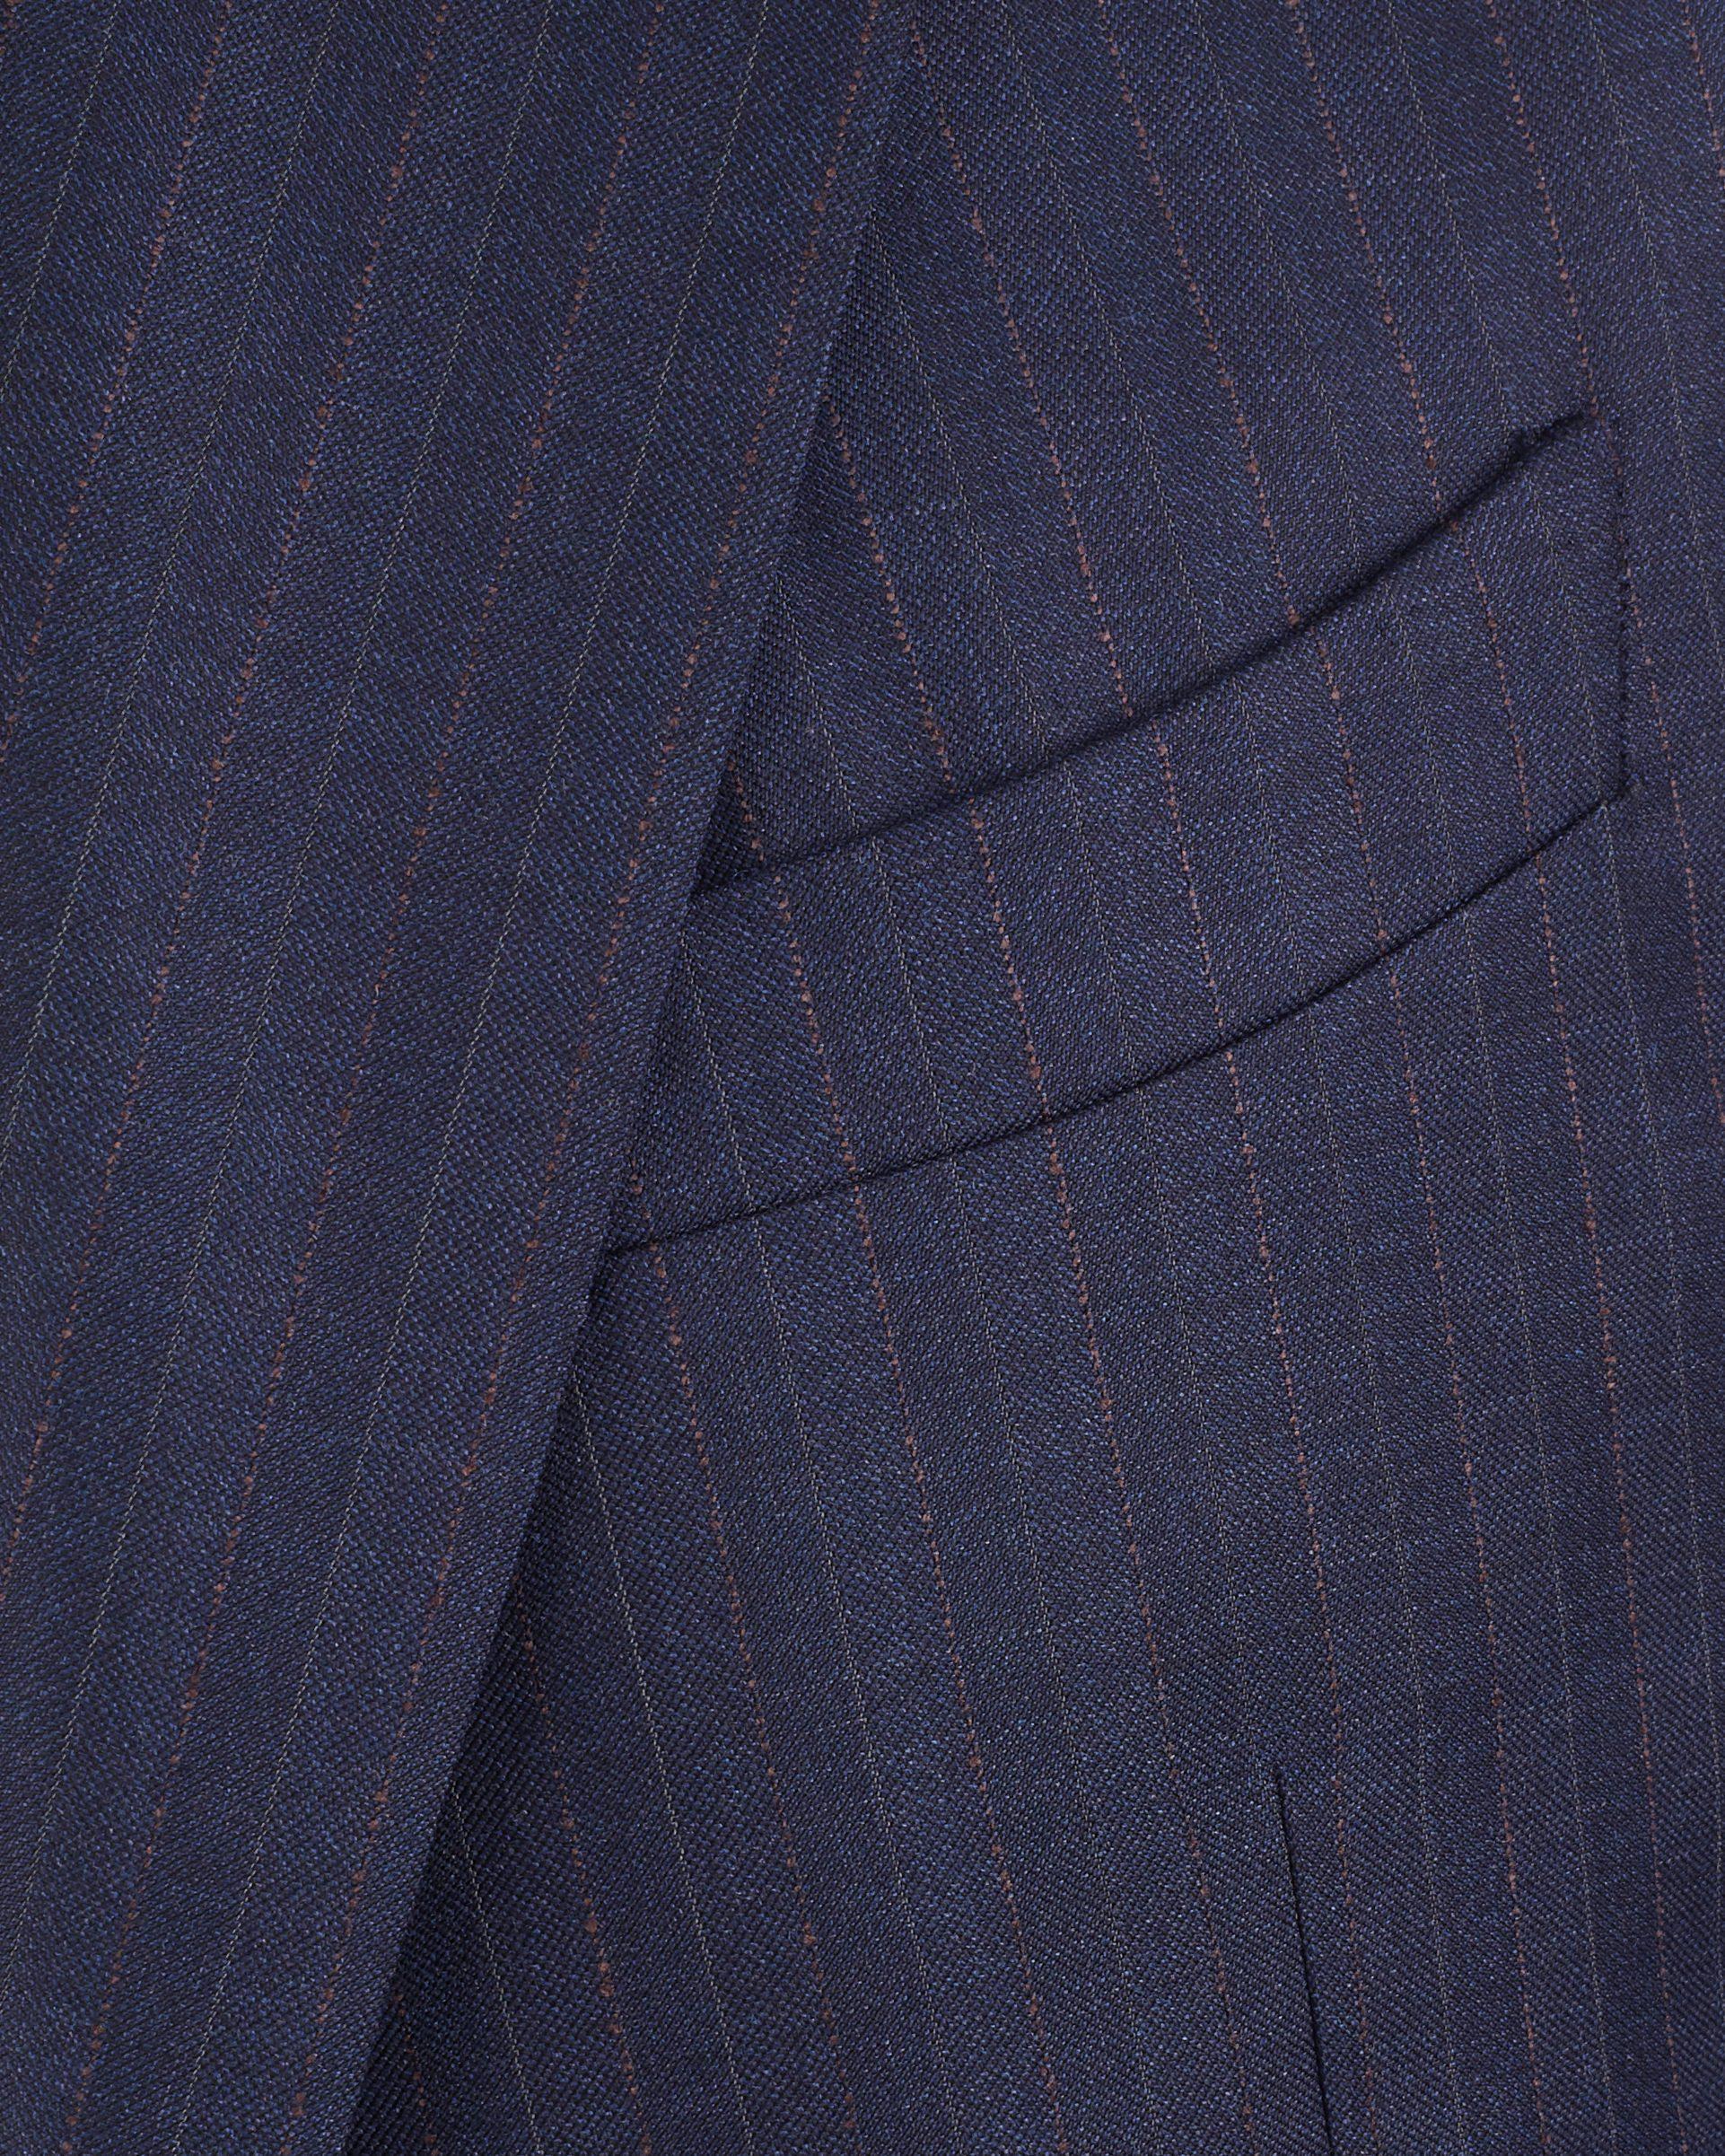 Costum-Barbati-Vitale-Barberis-Canonico-Diplomat-Magazin-Costume-Barbati-Cluj-Napoca-Gentlemens-Boutique-Gold-Soporului-8-Detalii-Material-Sacou-